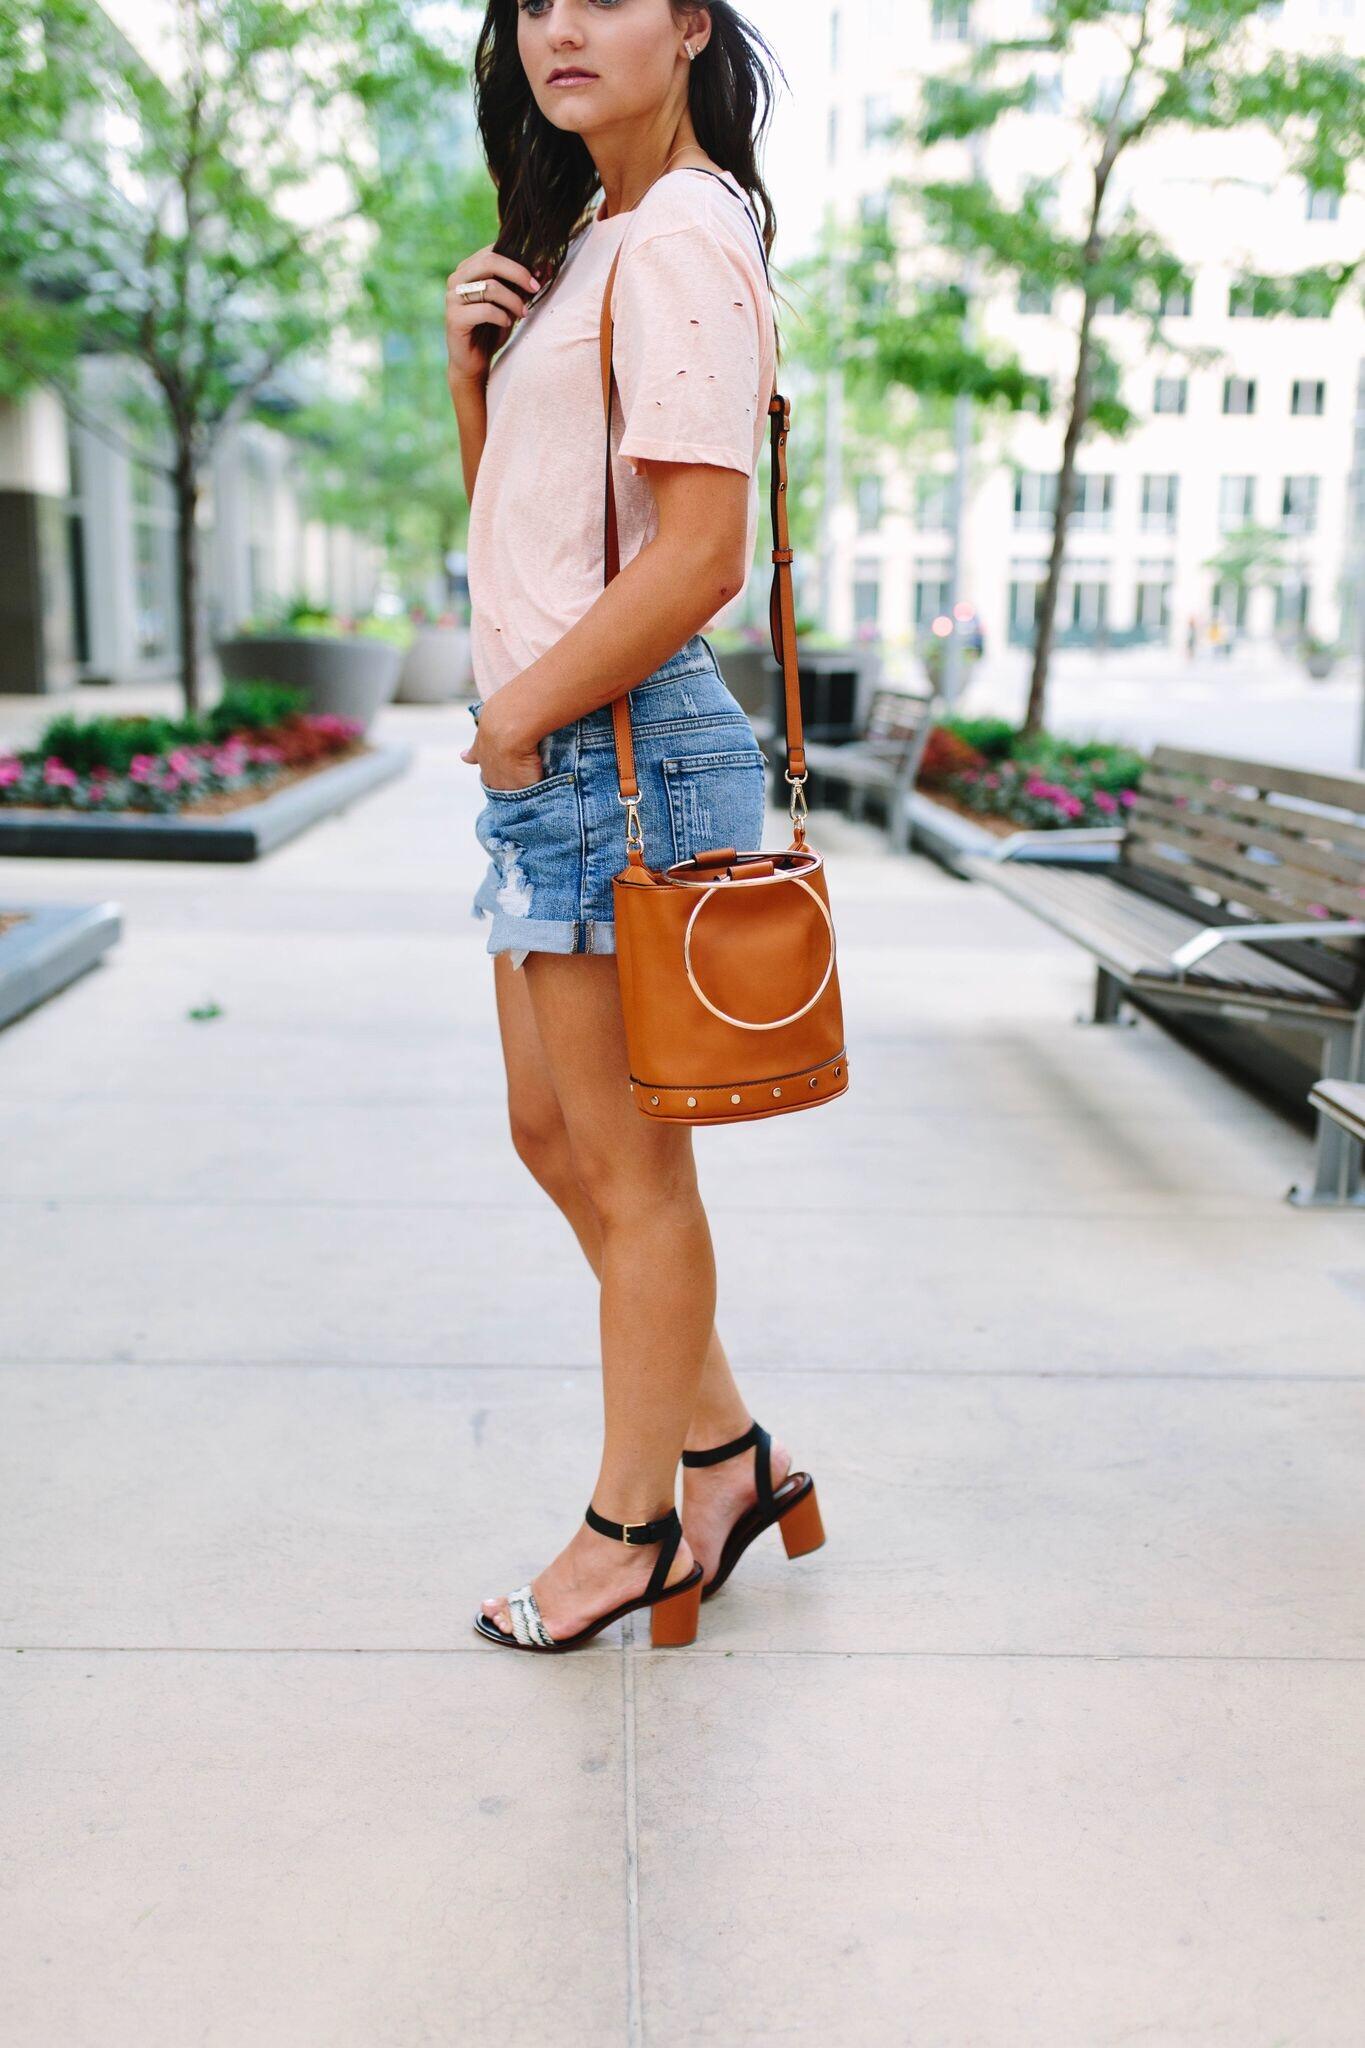 "<img src = ""how-to-shop-designer-brands-for-less.jpg"" alt = ""how-to-shop-designer-brands-for-less-cole-haan-cambon-snakeskin-sandals-summer-fashion"""